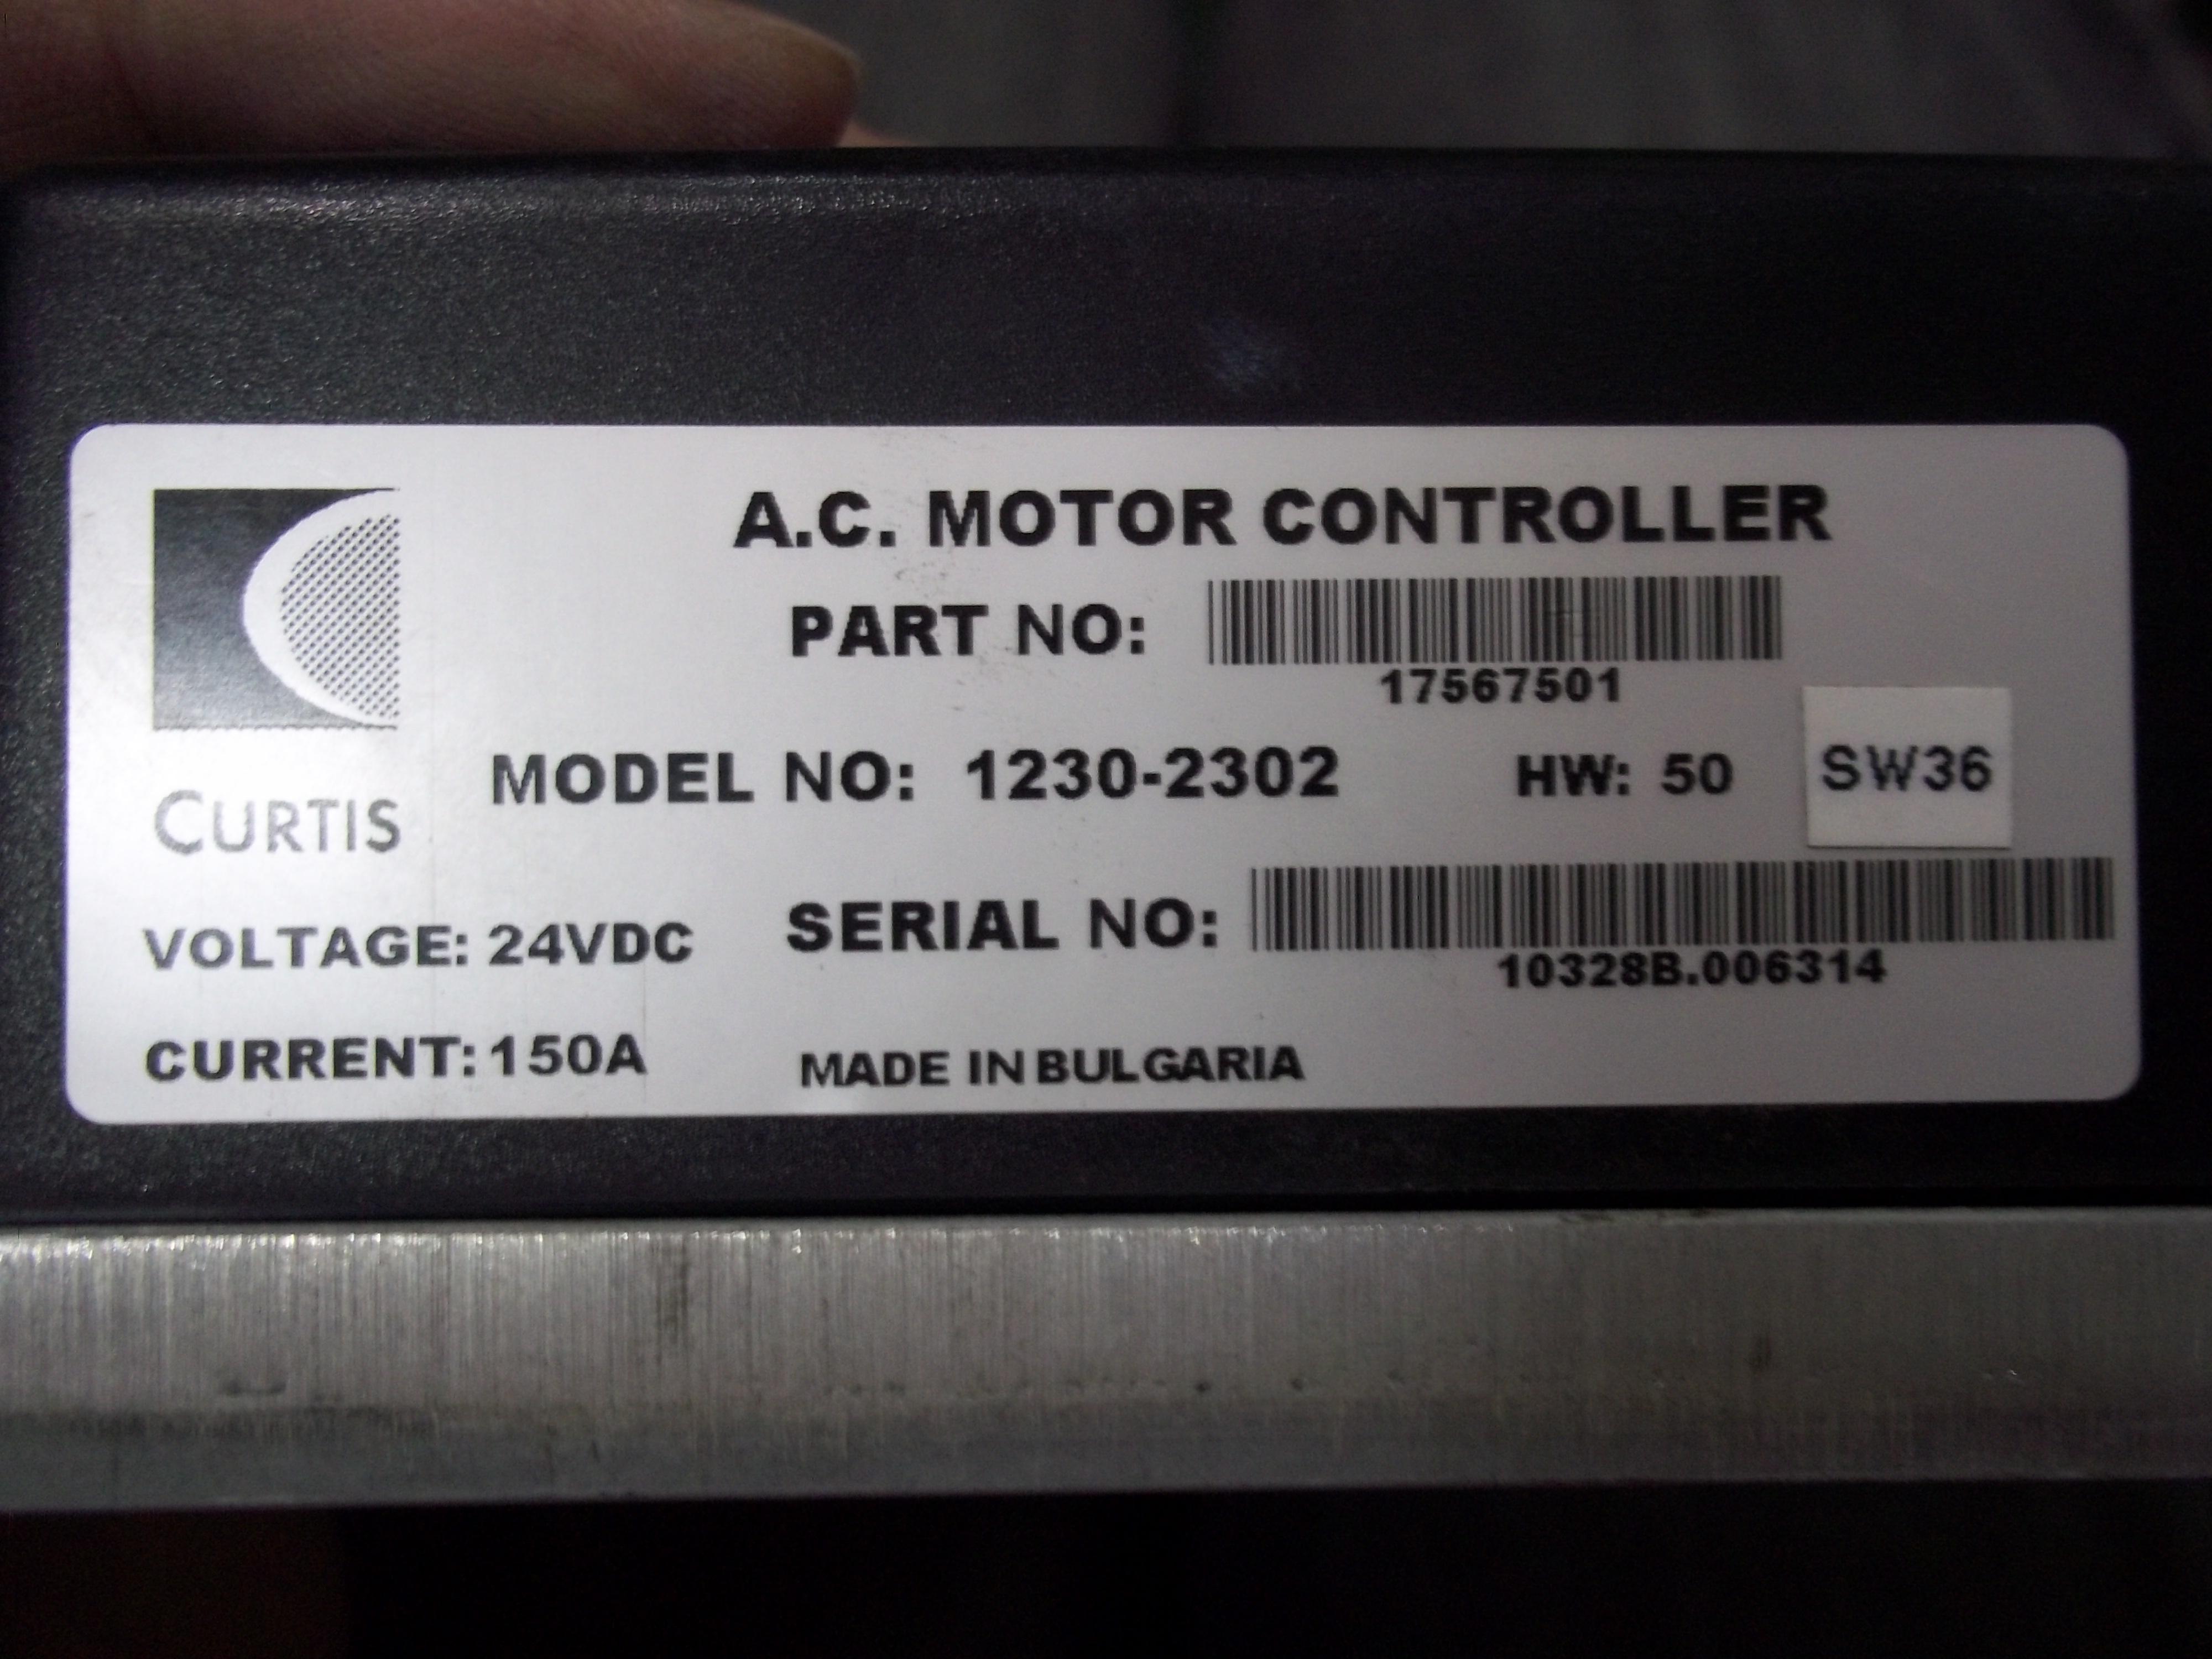 Repair 1230-2302 CURTIS CURTIS MOTOR CONTROLLER in Malaysia, Singapore, Thailand, Indonesia